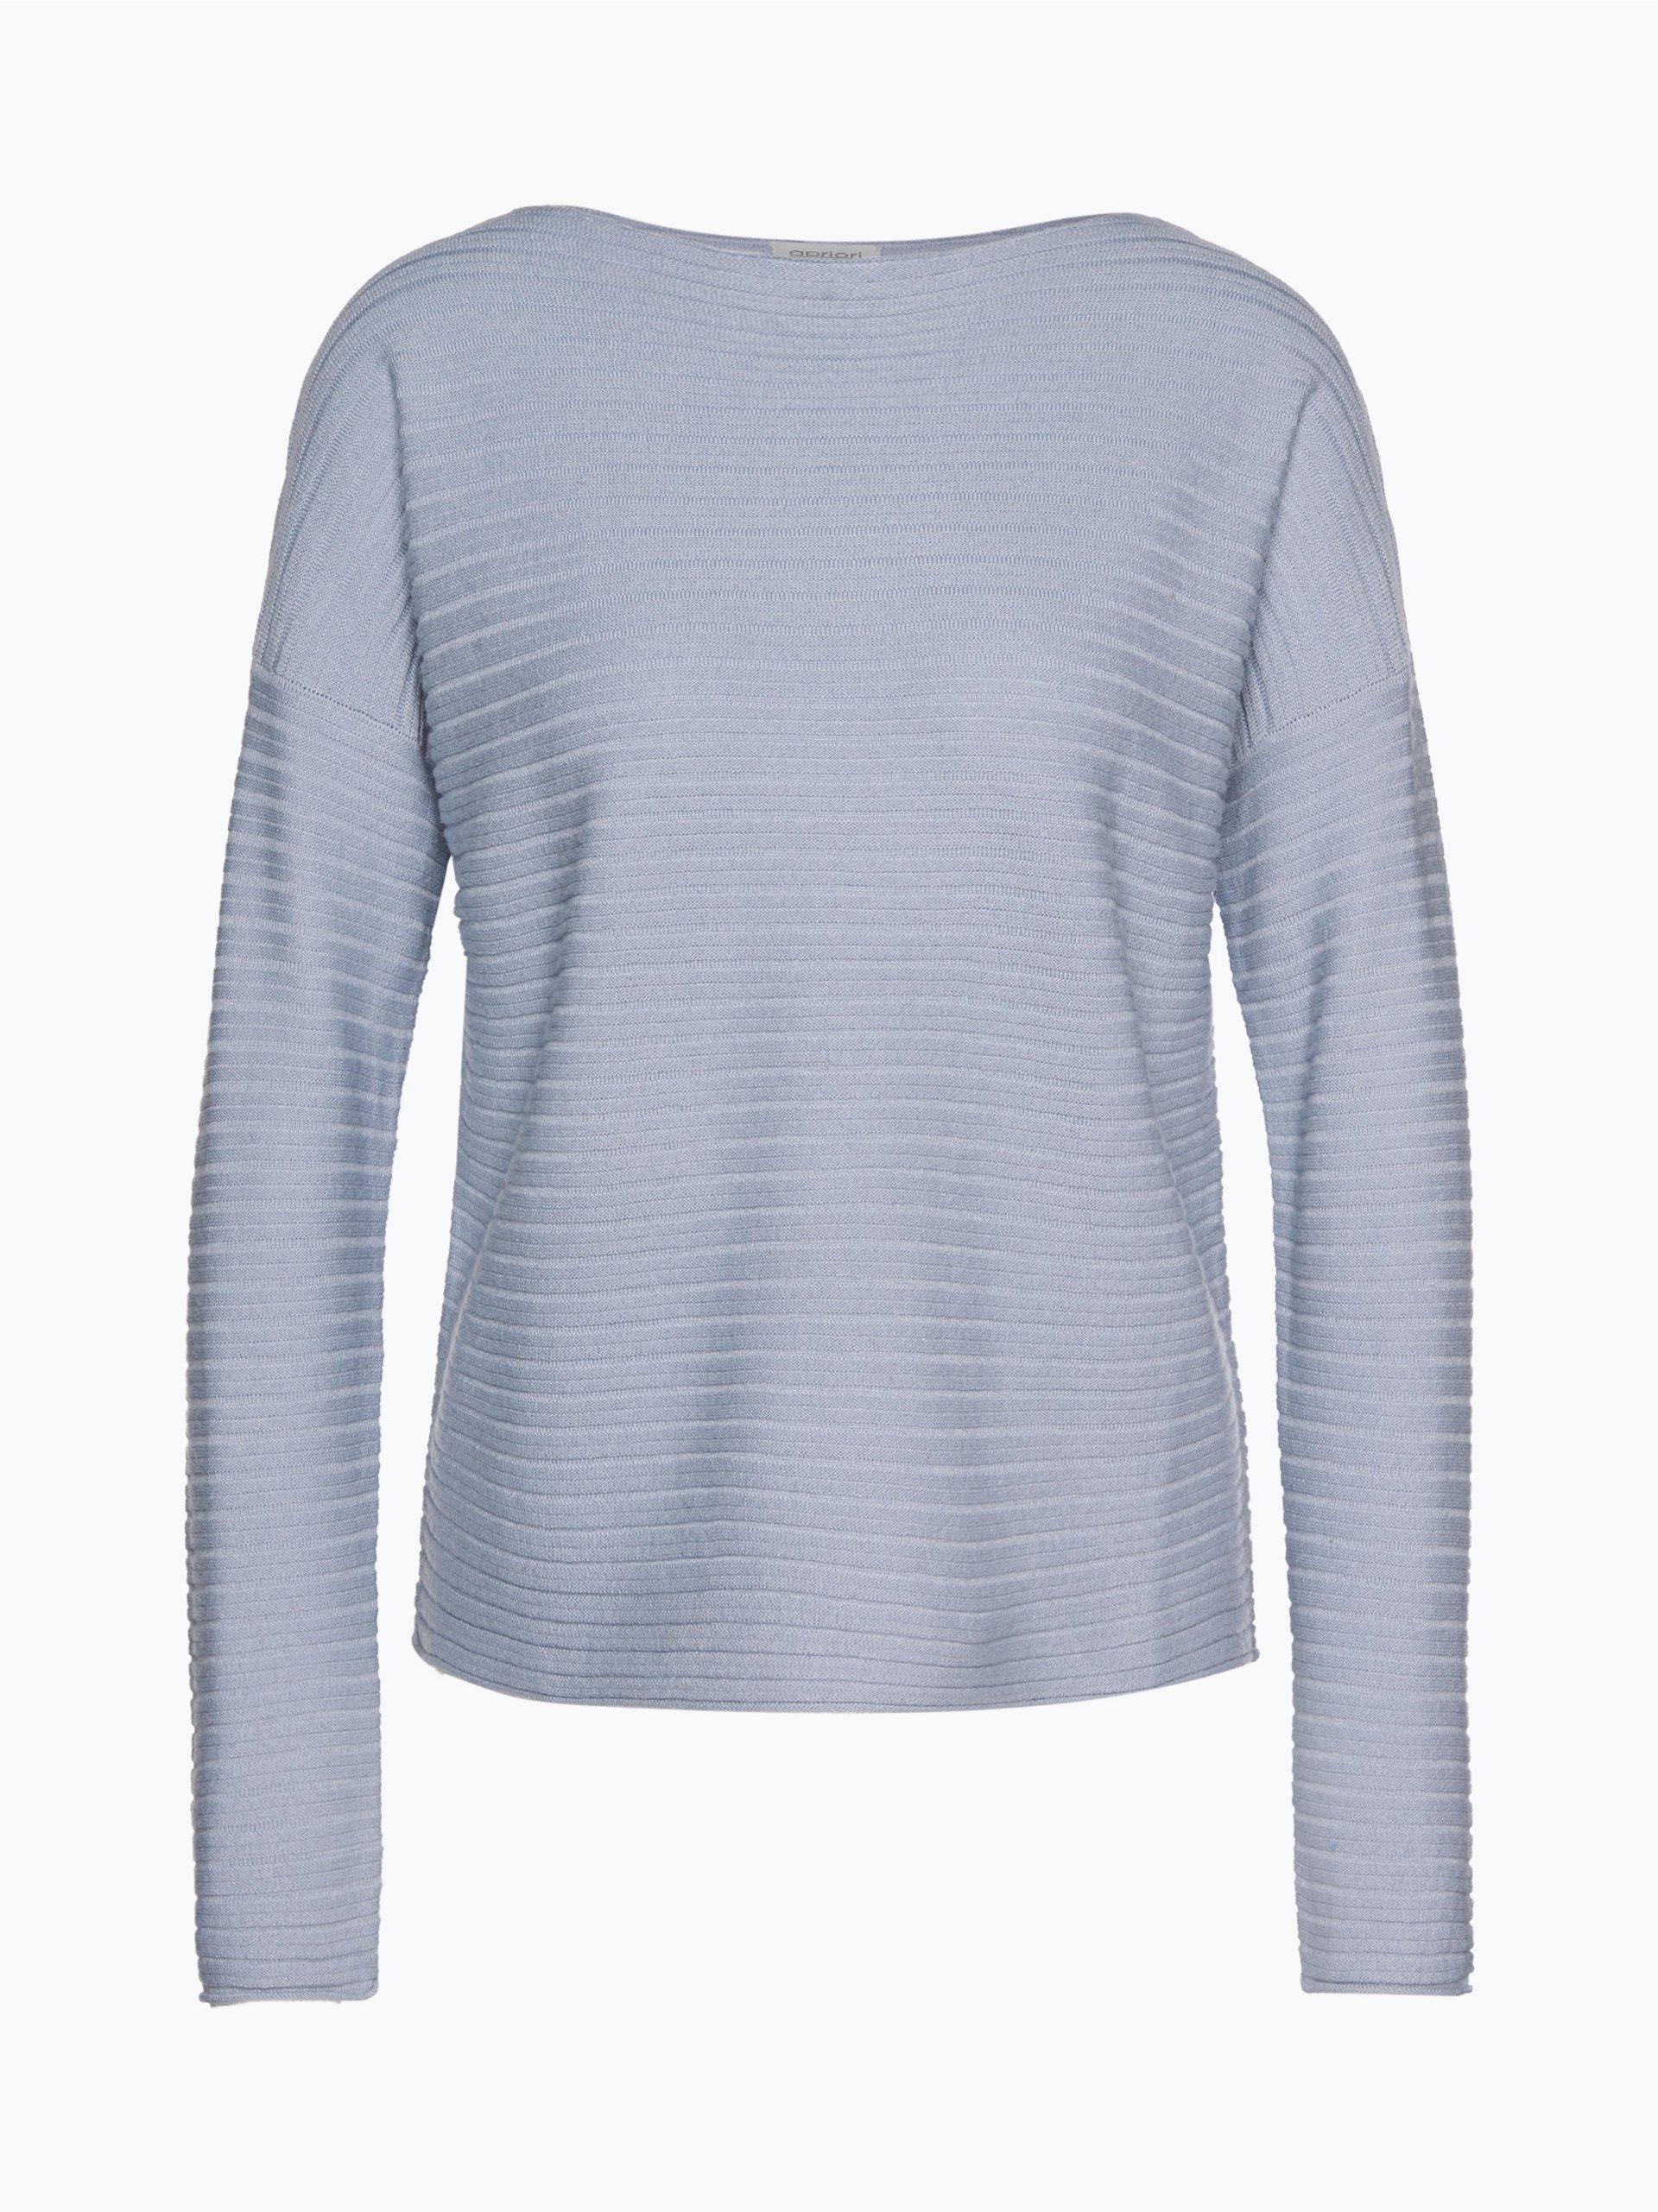 apriori damen pullover aus cashmere merino mix blau uni. Black Bedroom Furniture Sets. Home Design Ideas